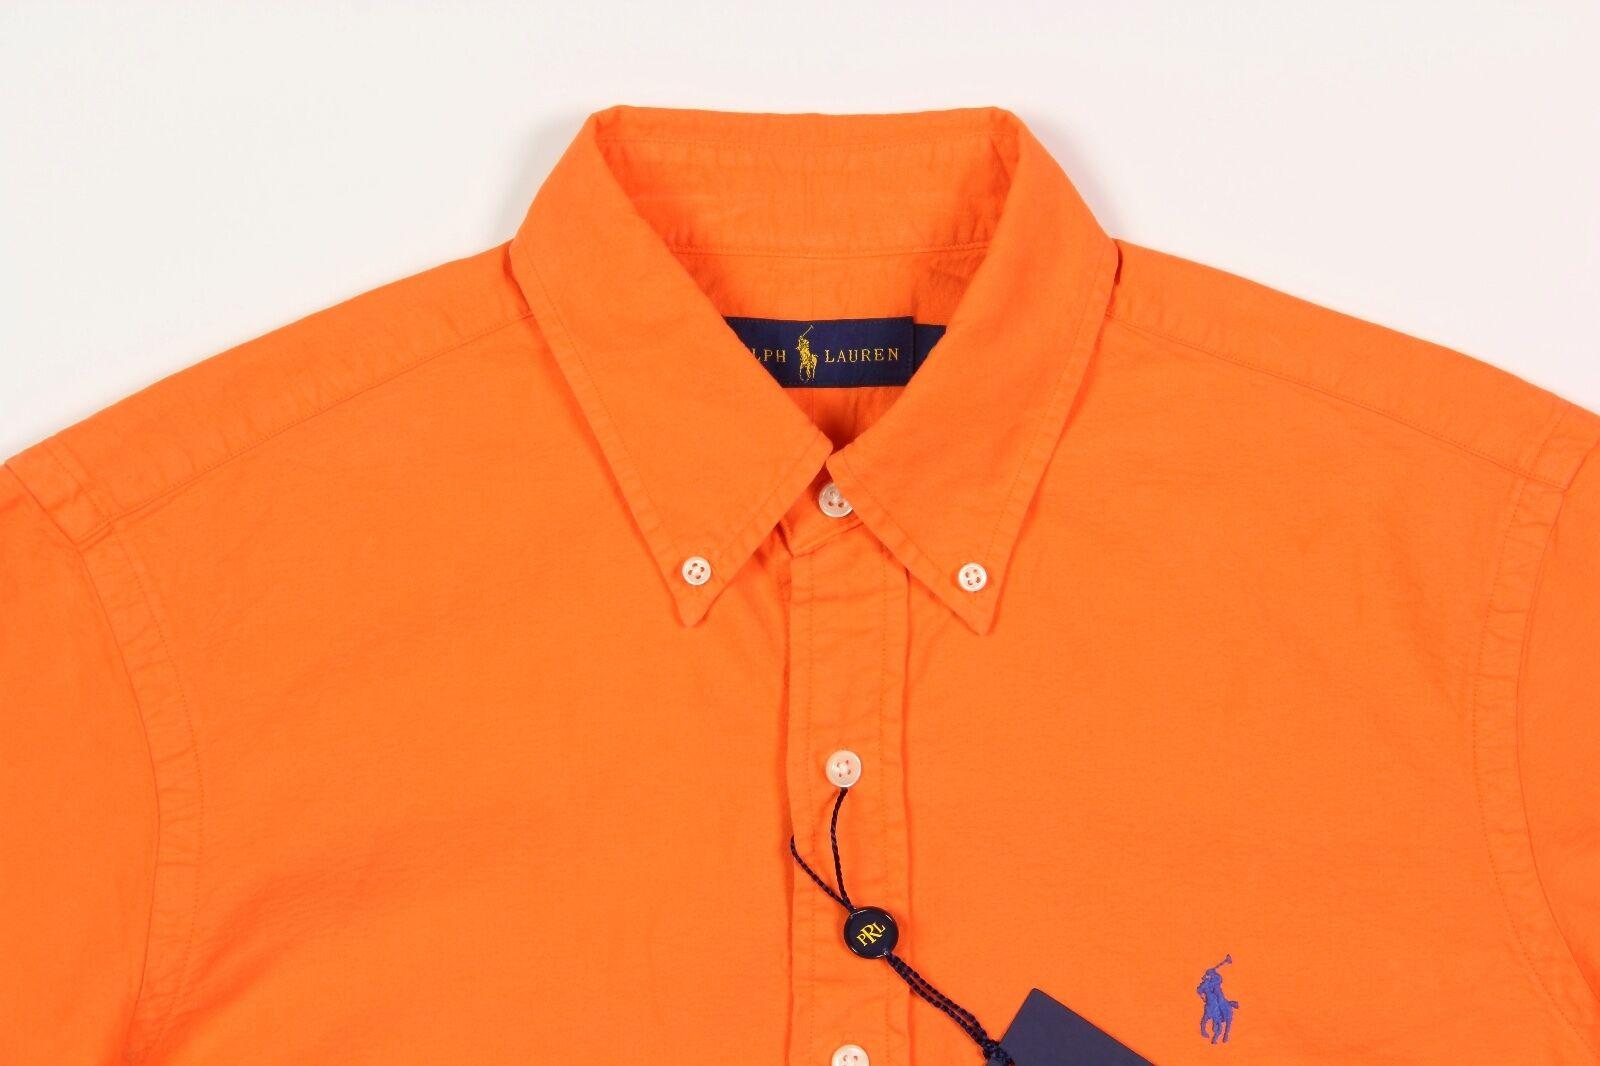 Men's RALPH LAUREN Resort orange Short Sleeve S S Cotton Shirt XL XLarge NWT NEW